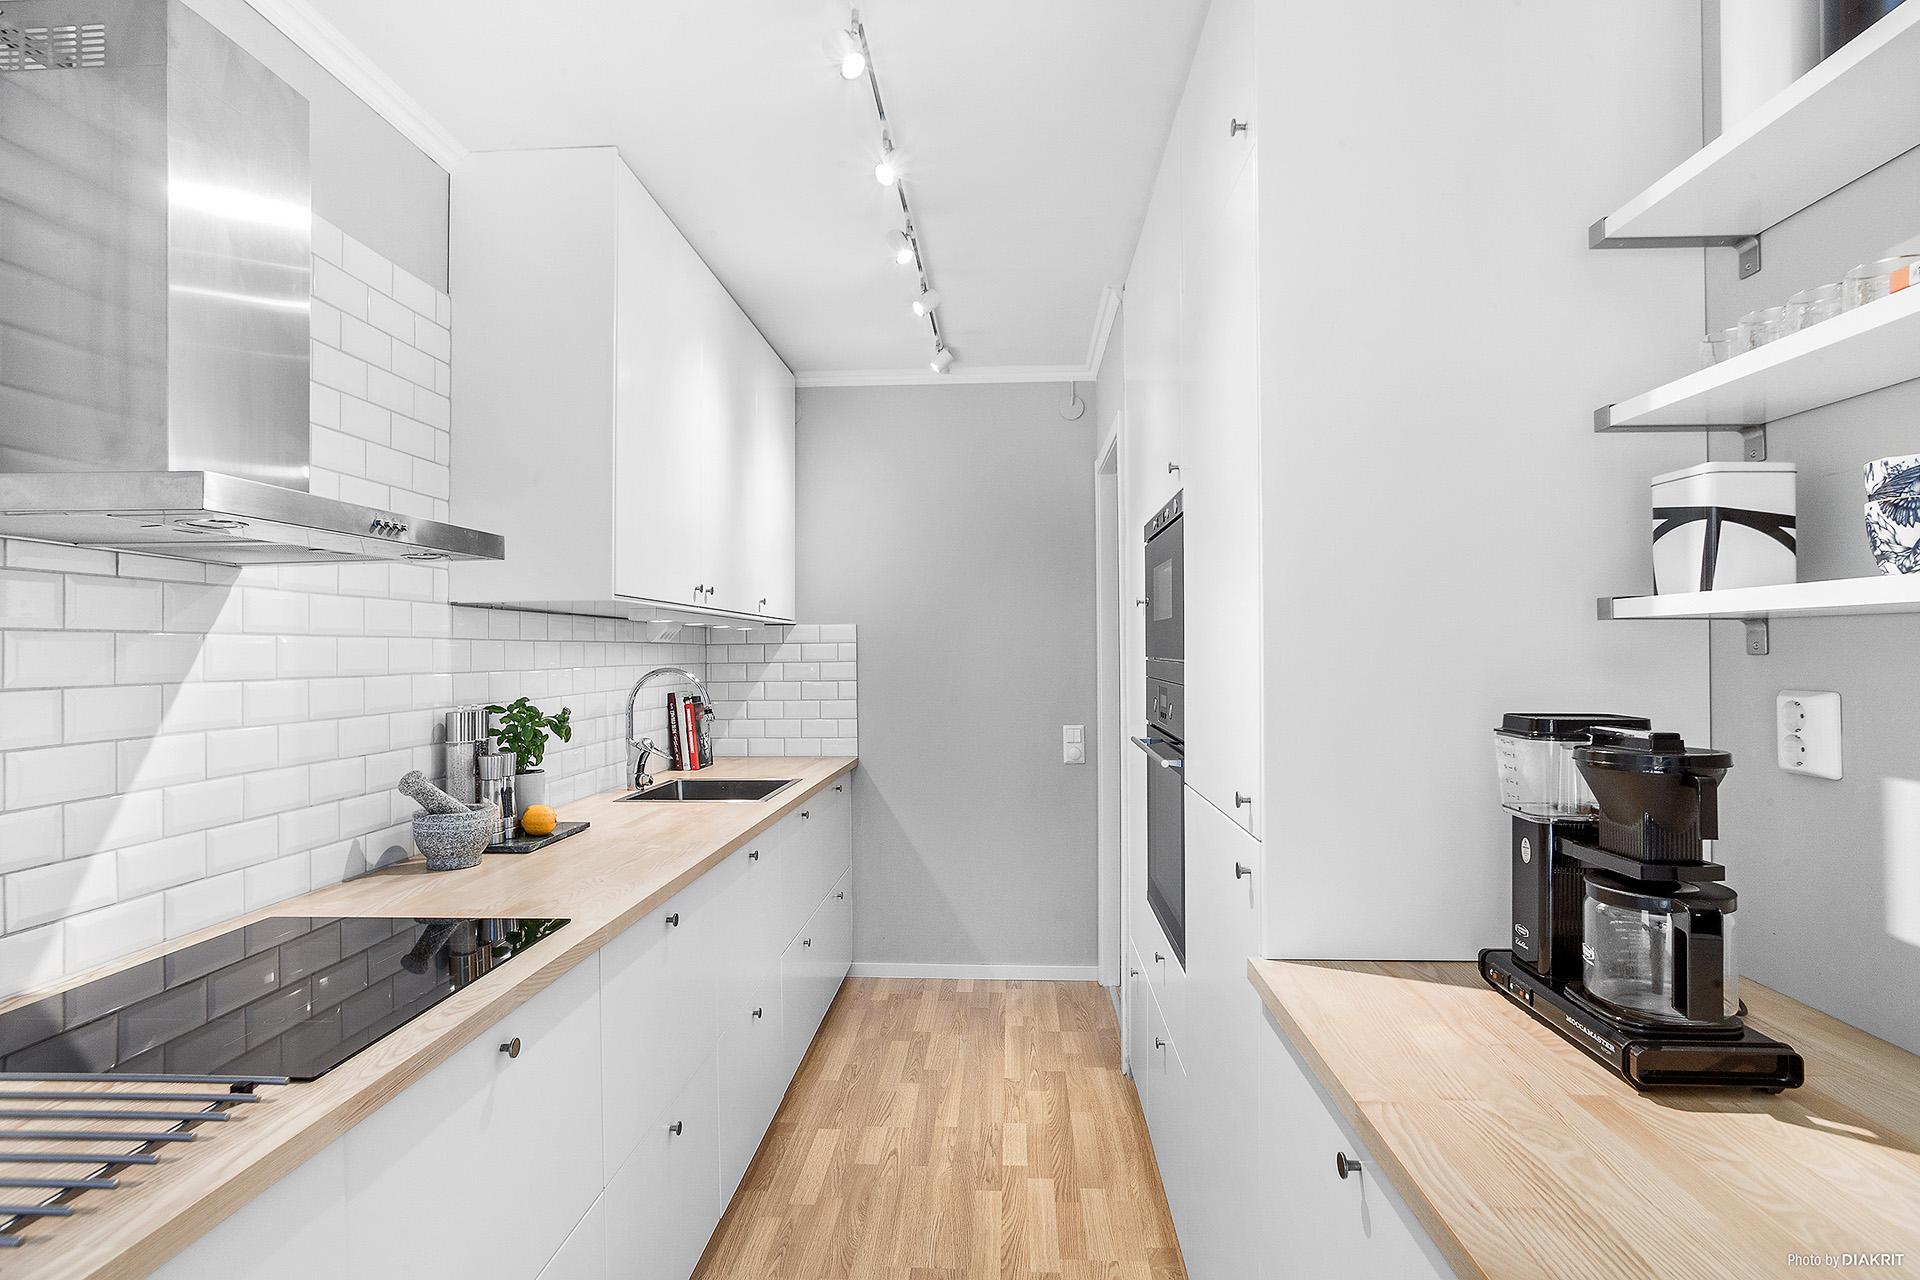 Modernt renoverat kök